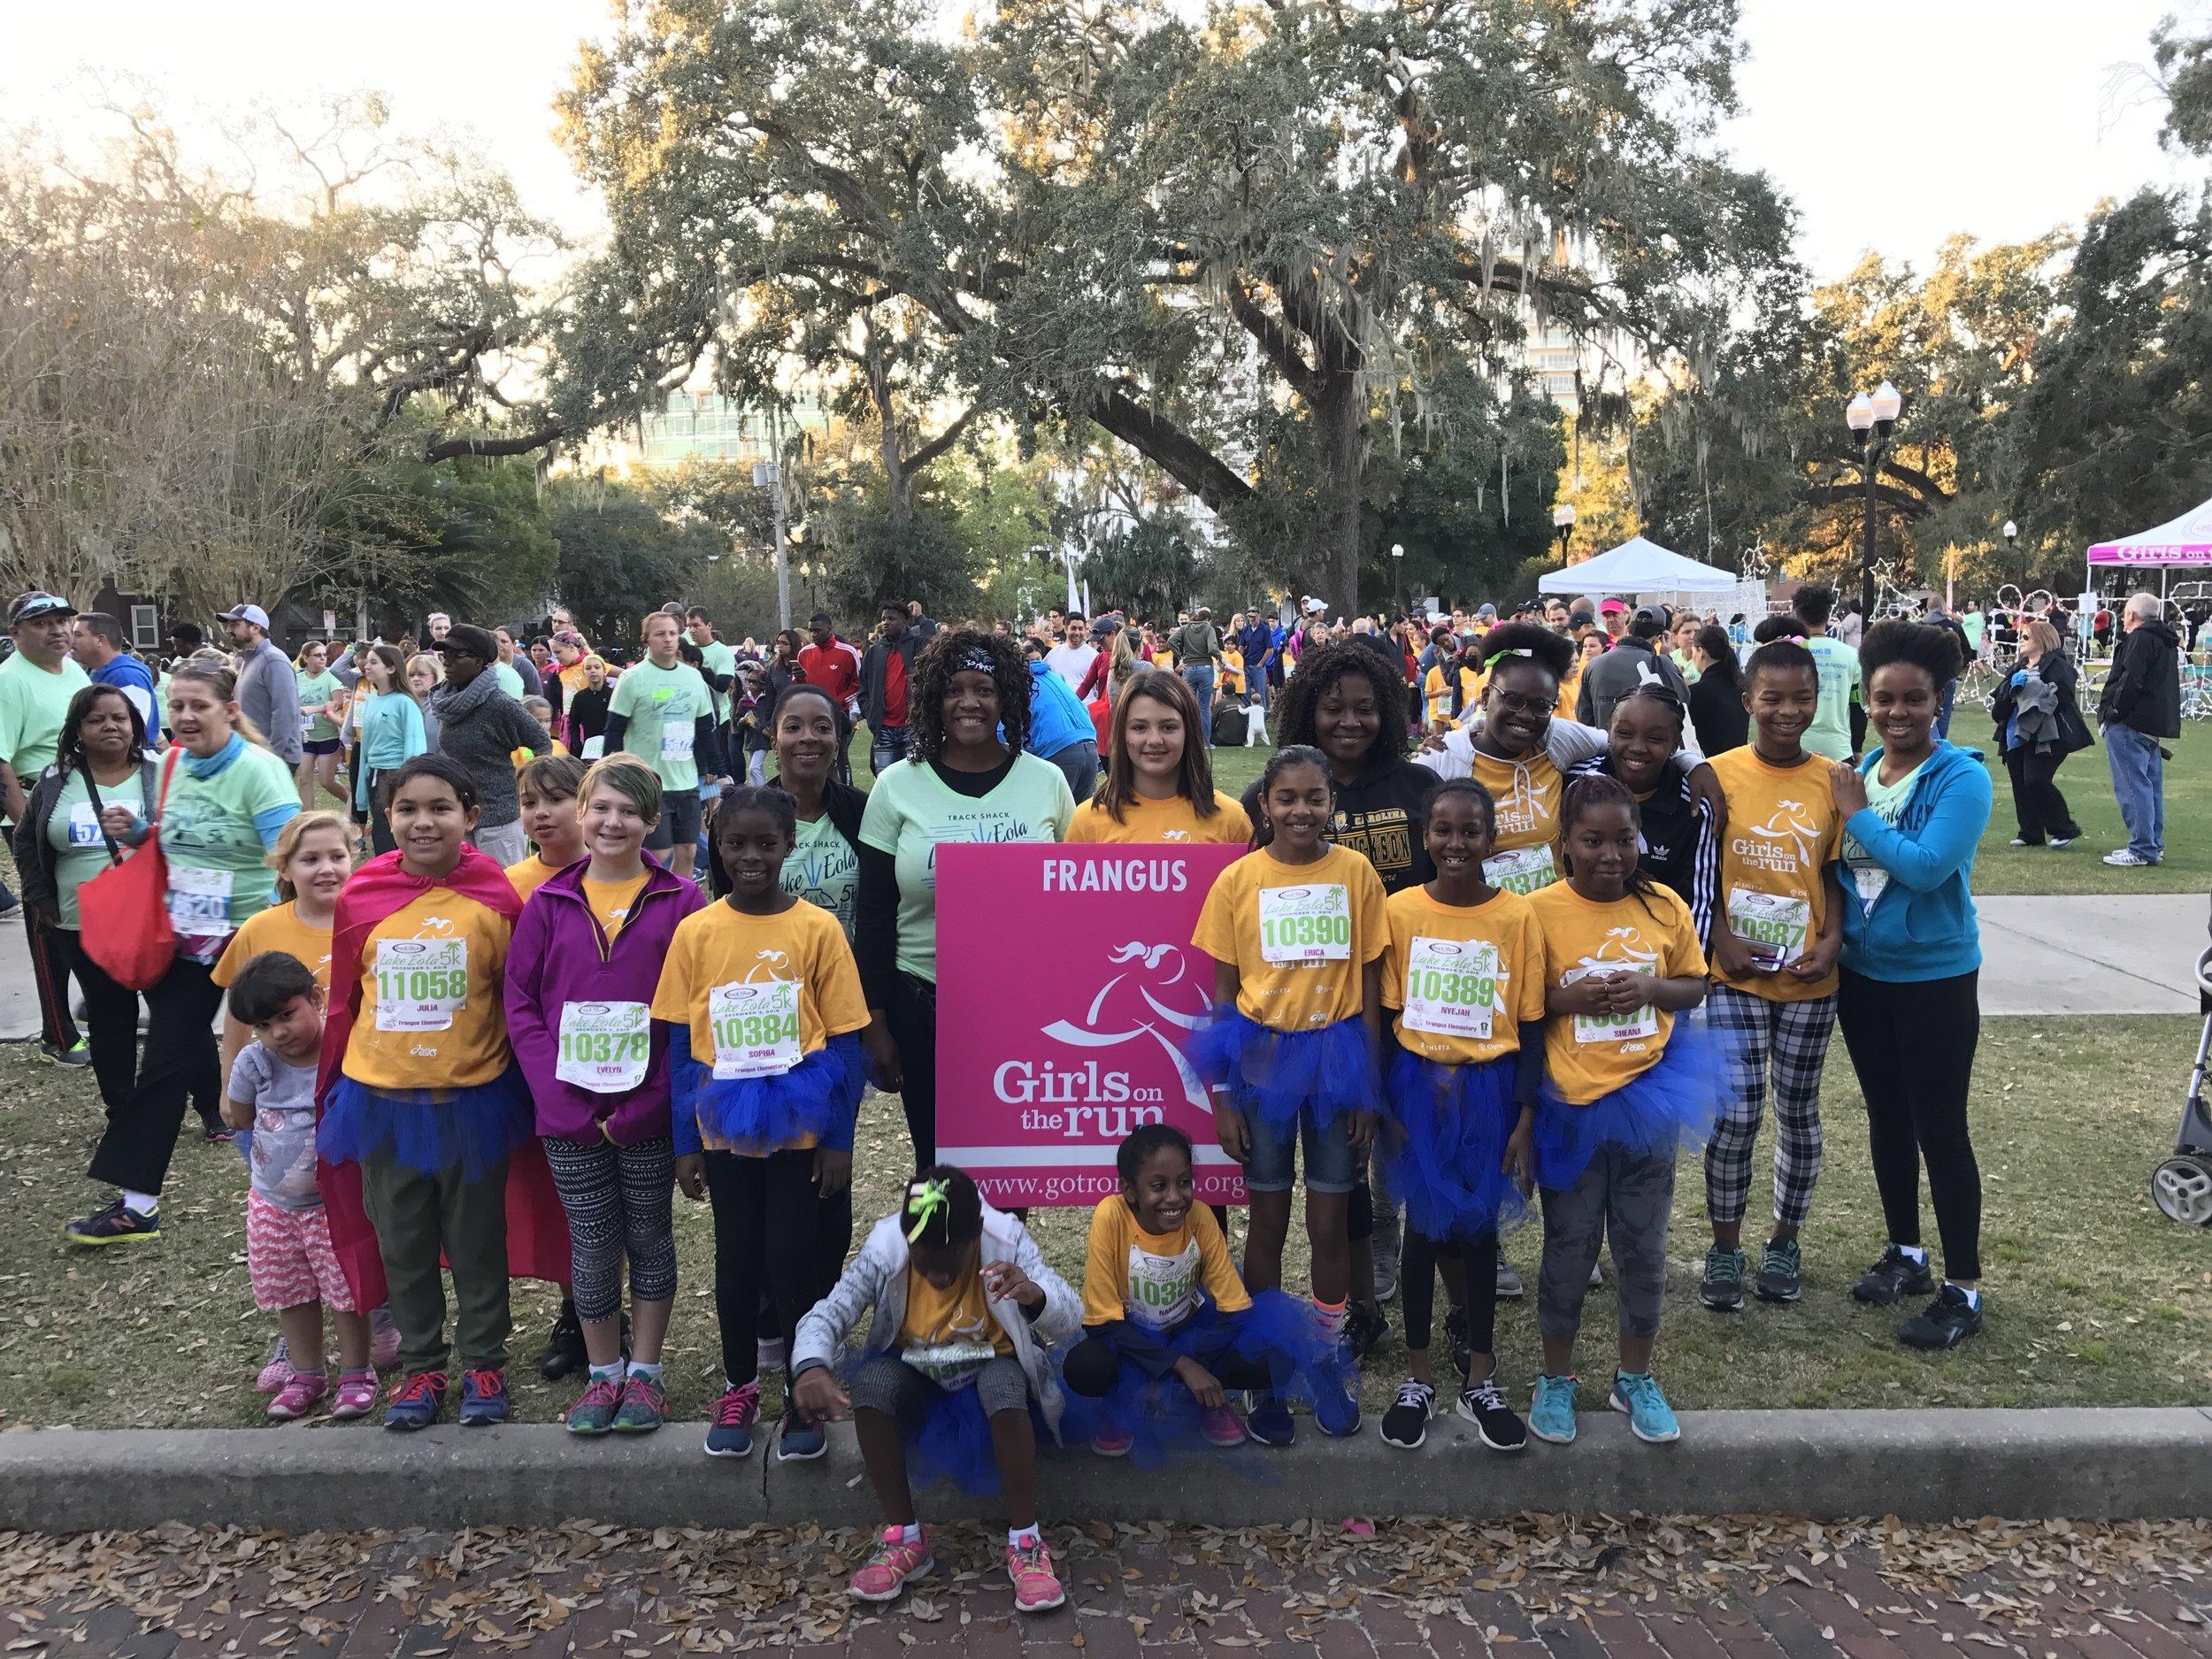 The Frangus Elementary Girls on the Run